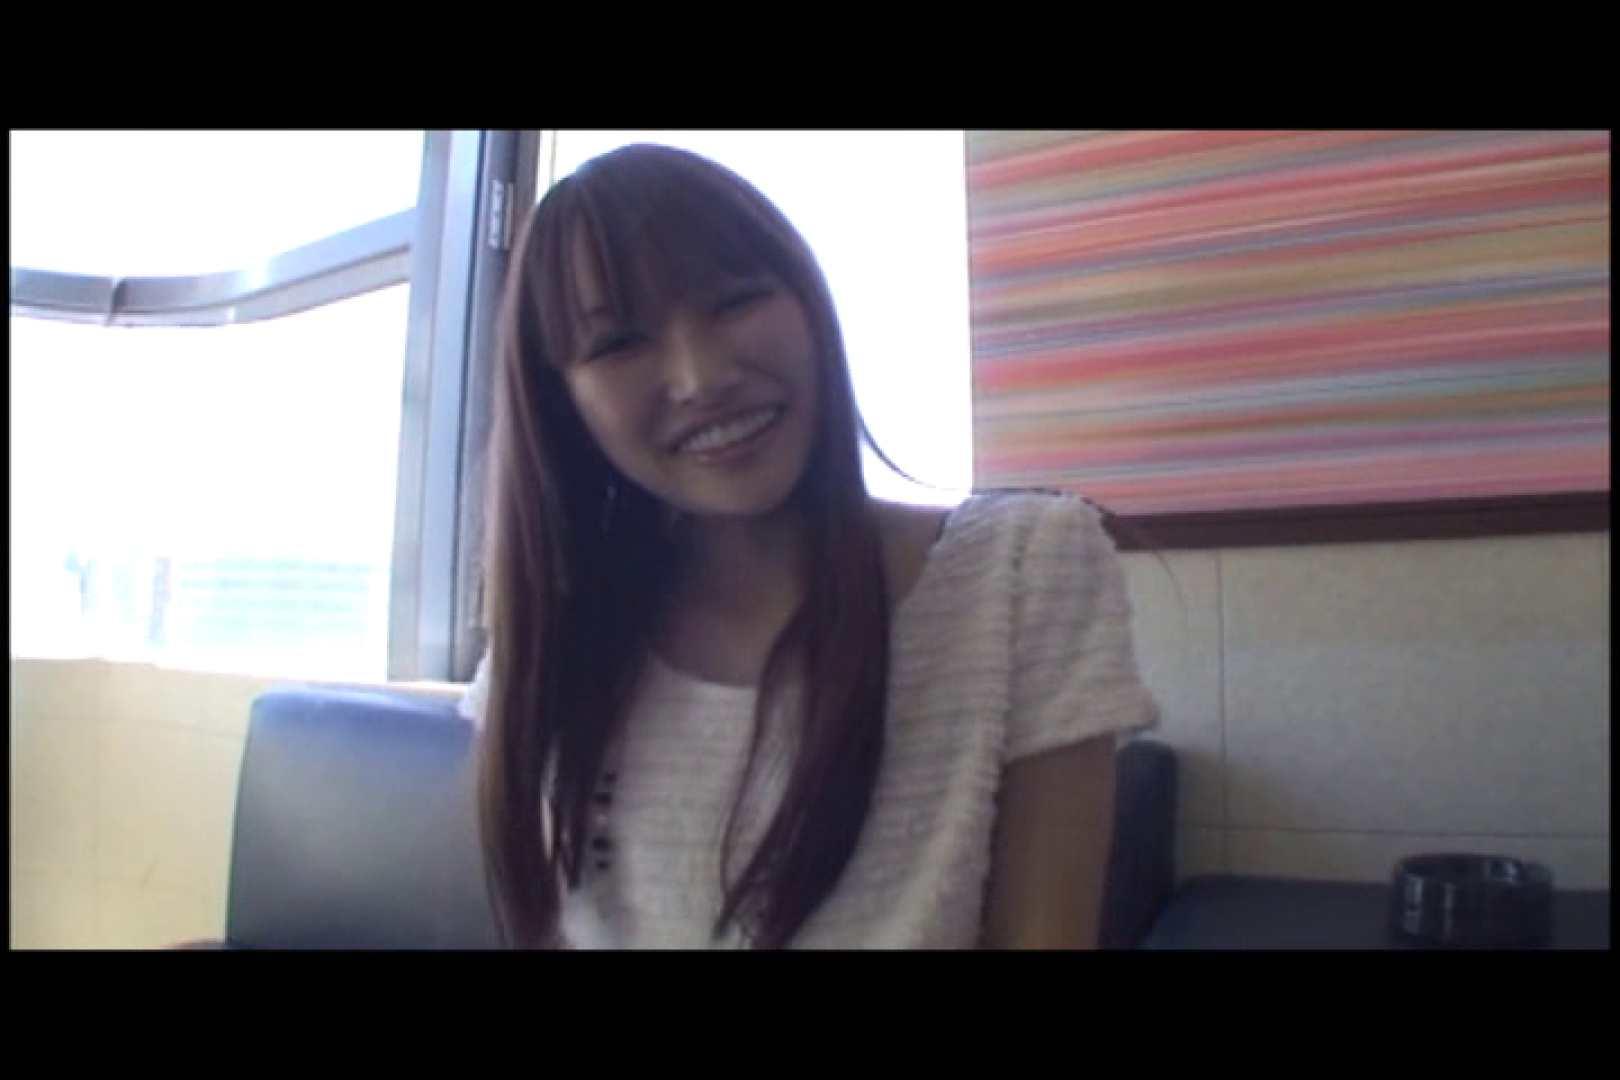 JDハンター全国ツアー vol.058 前編 女子大生のエロ動画 | 0  77PIX 19